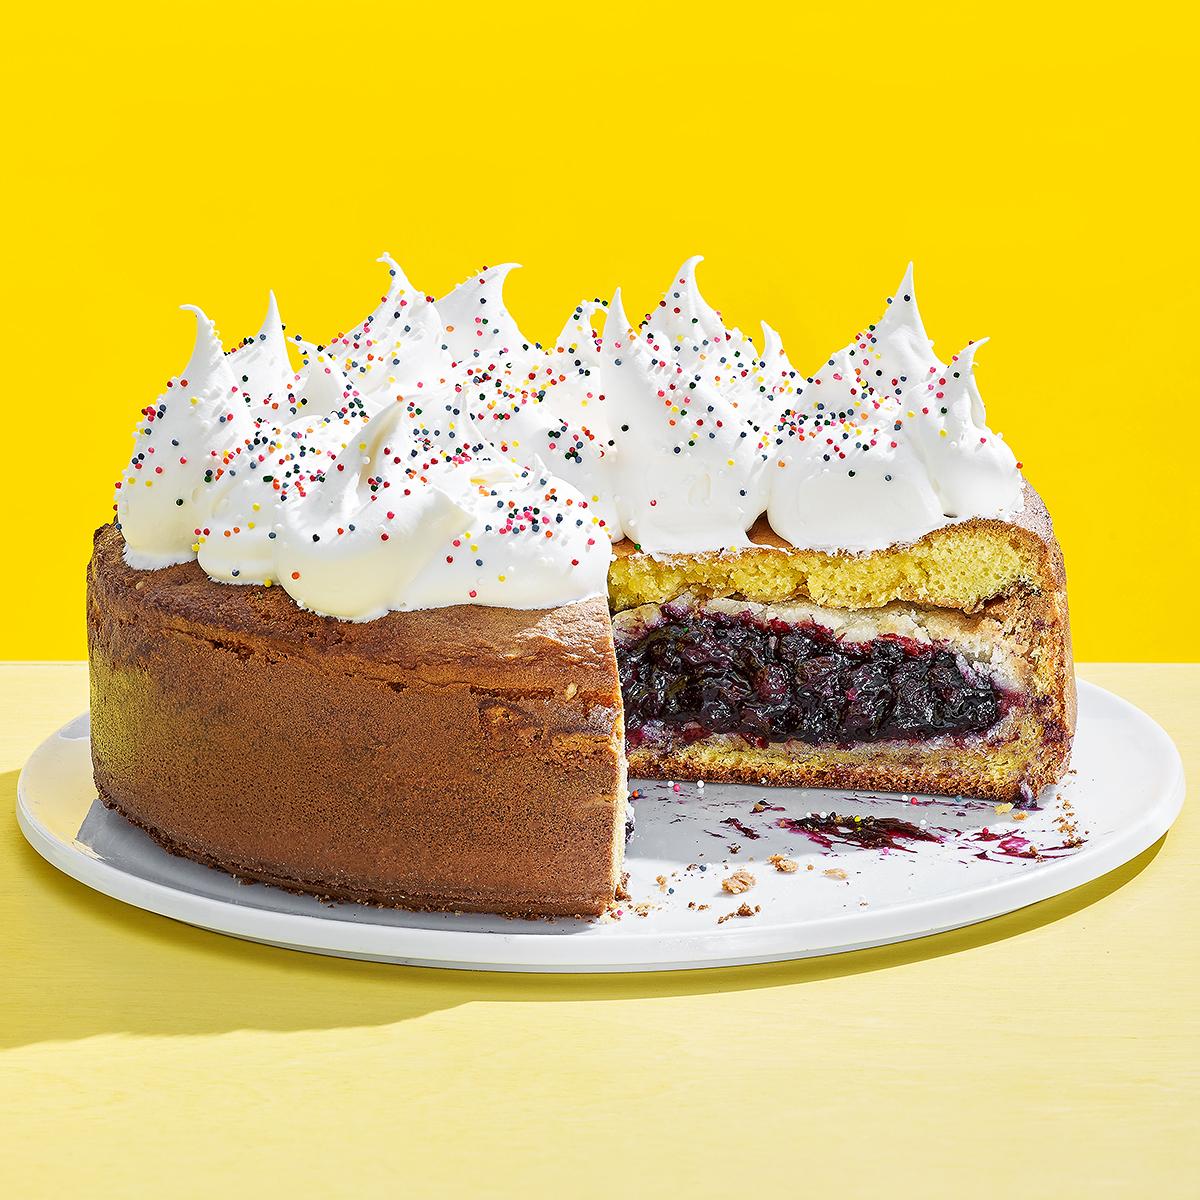 Blueberry Pie Caken